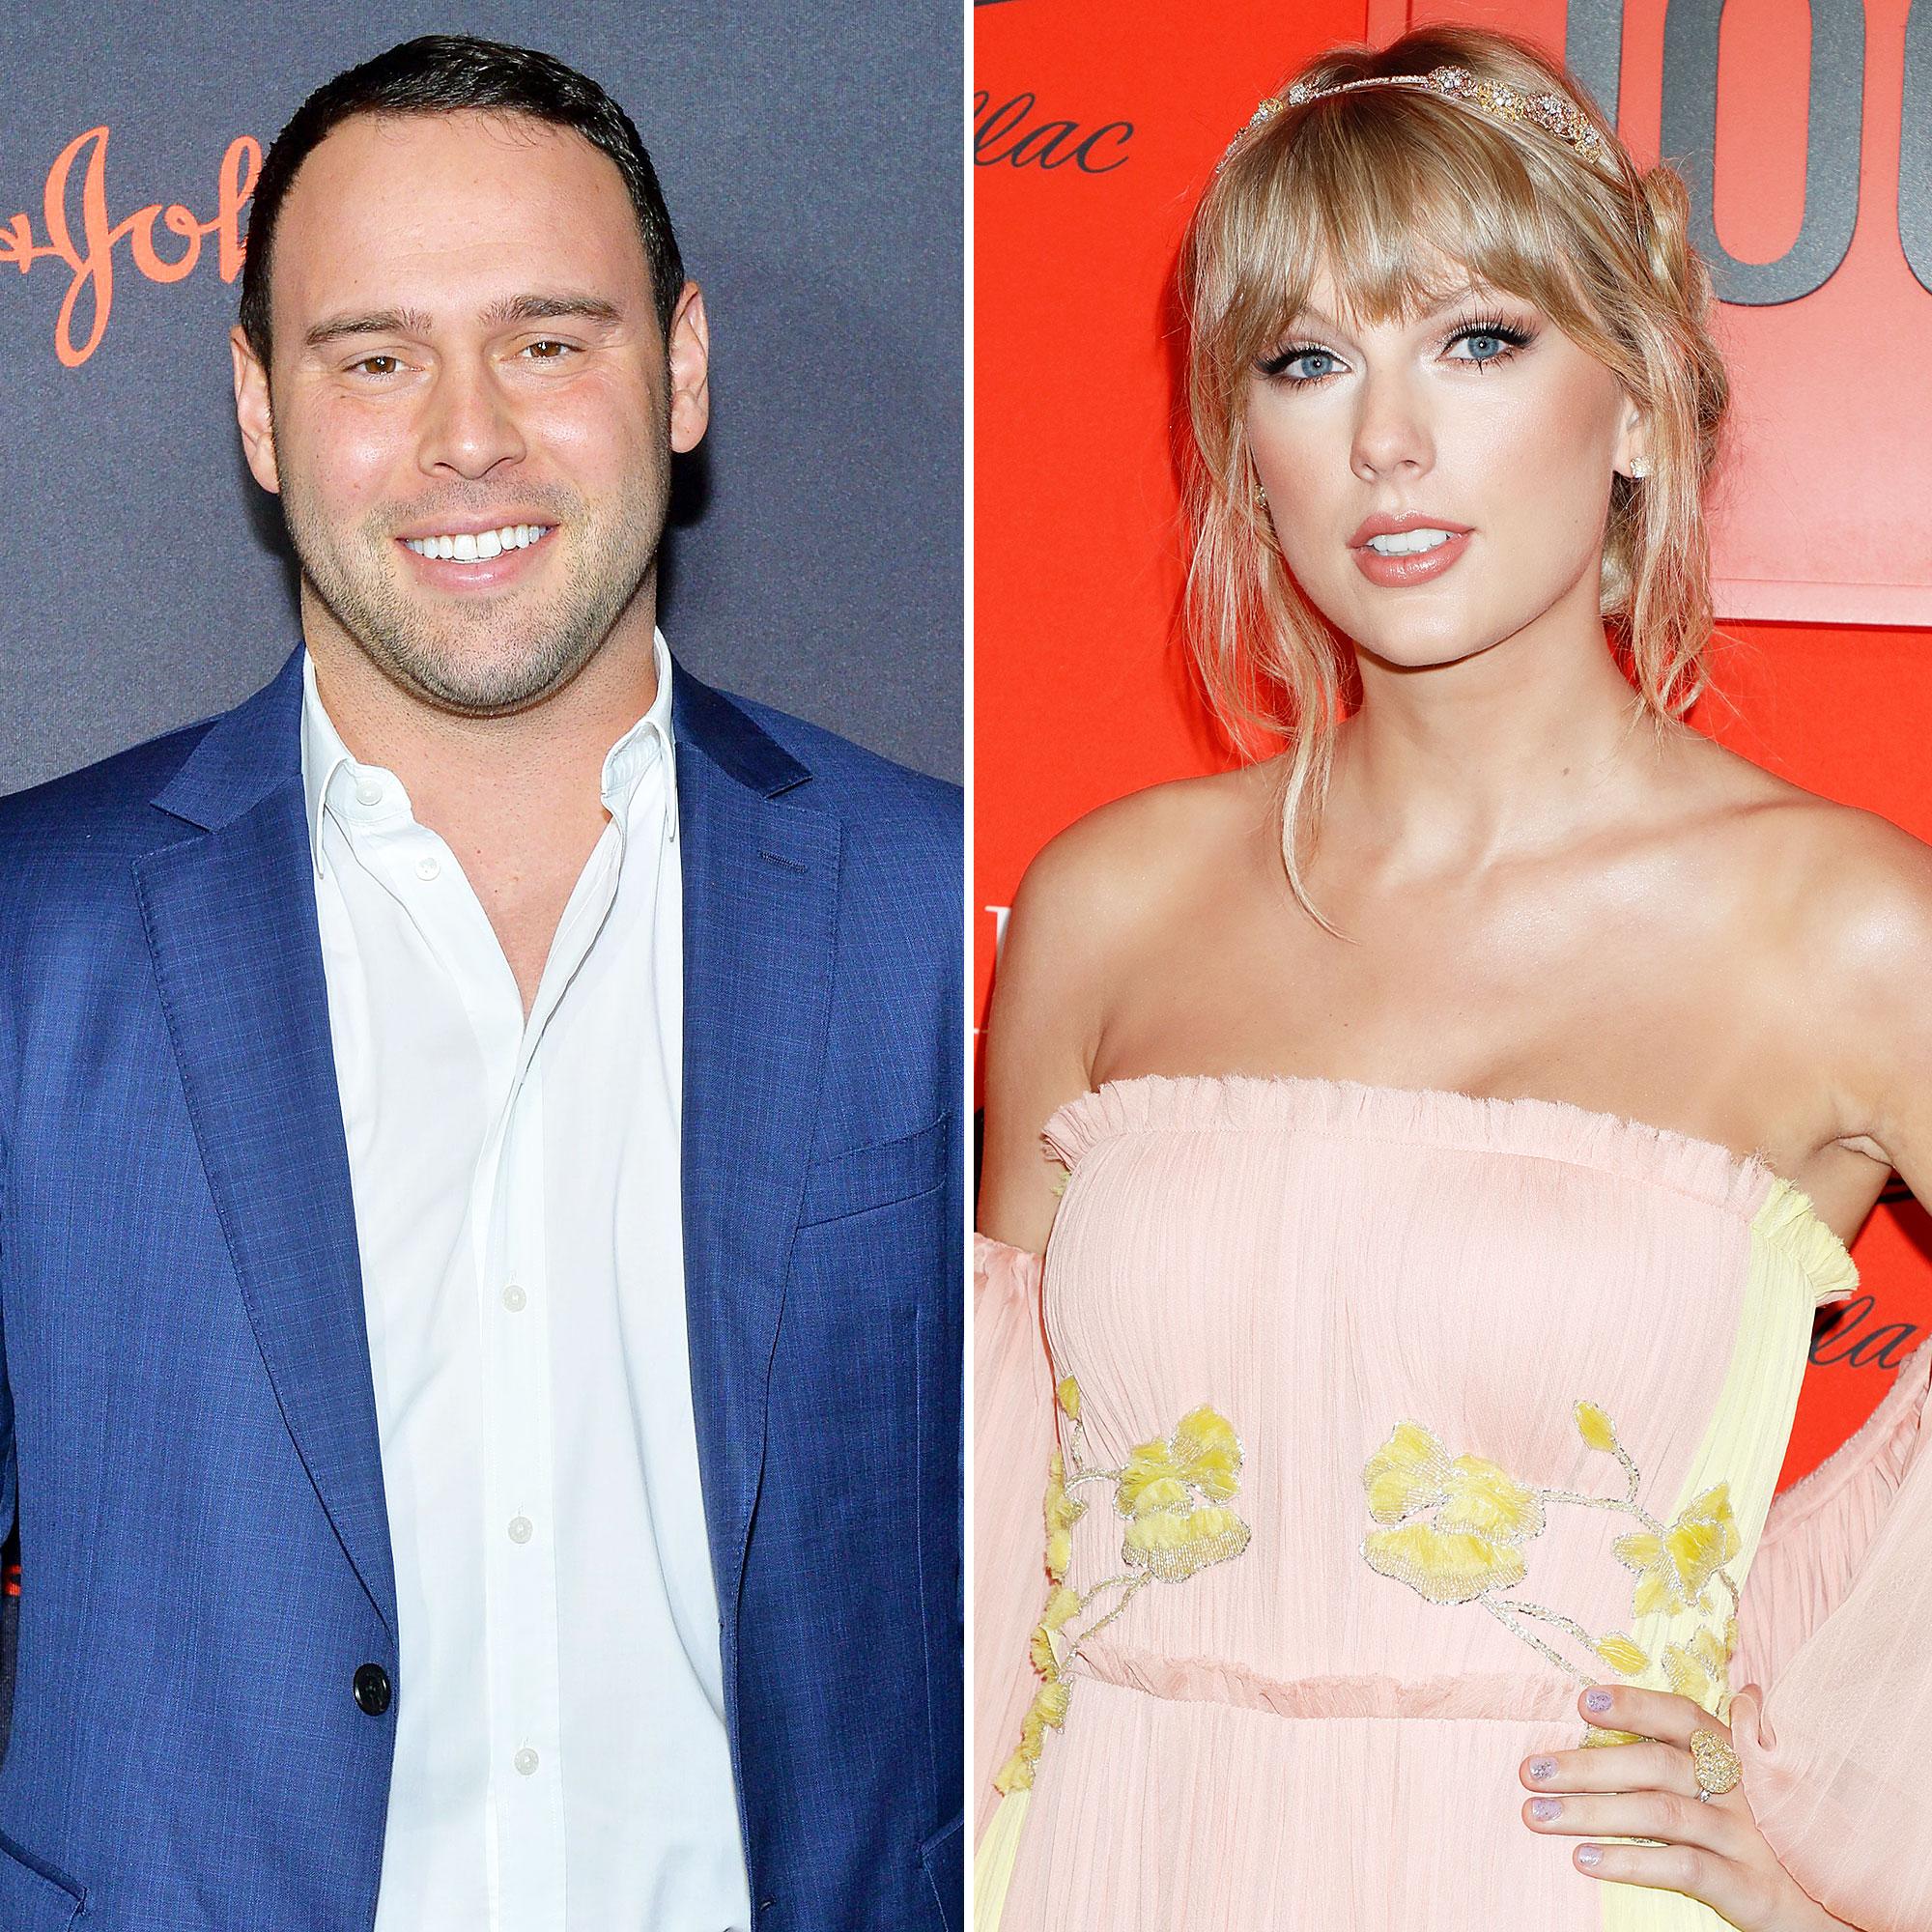 Scooter Braun Congratulates Taylor Swift on 'Brilliant' New Album 'Lover